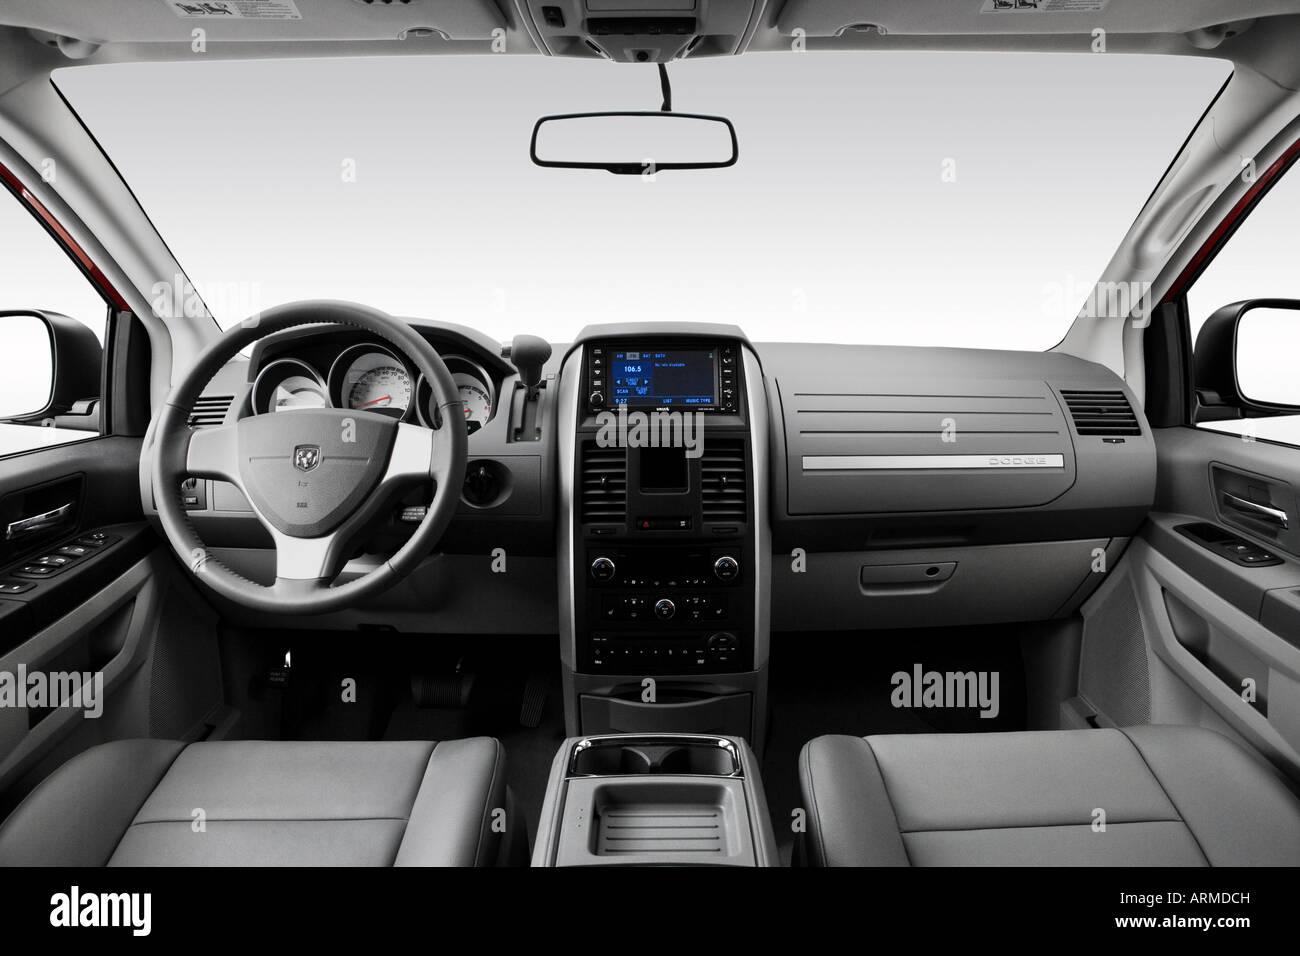 2008 dodge grand caravan sxt in red dashboard center console gear shifter view